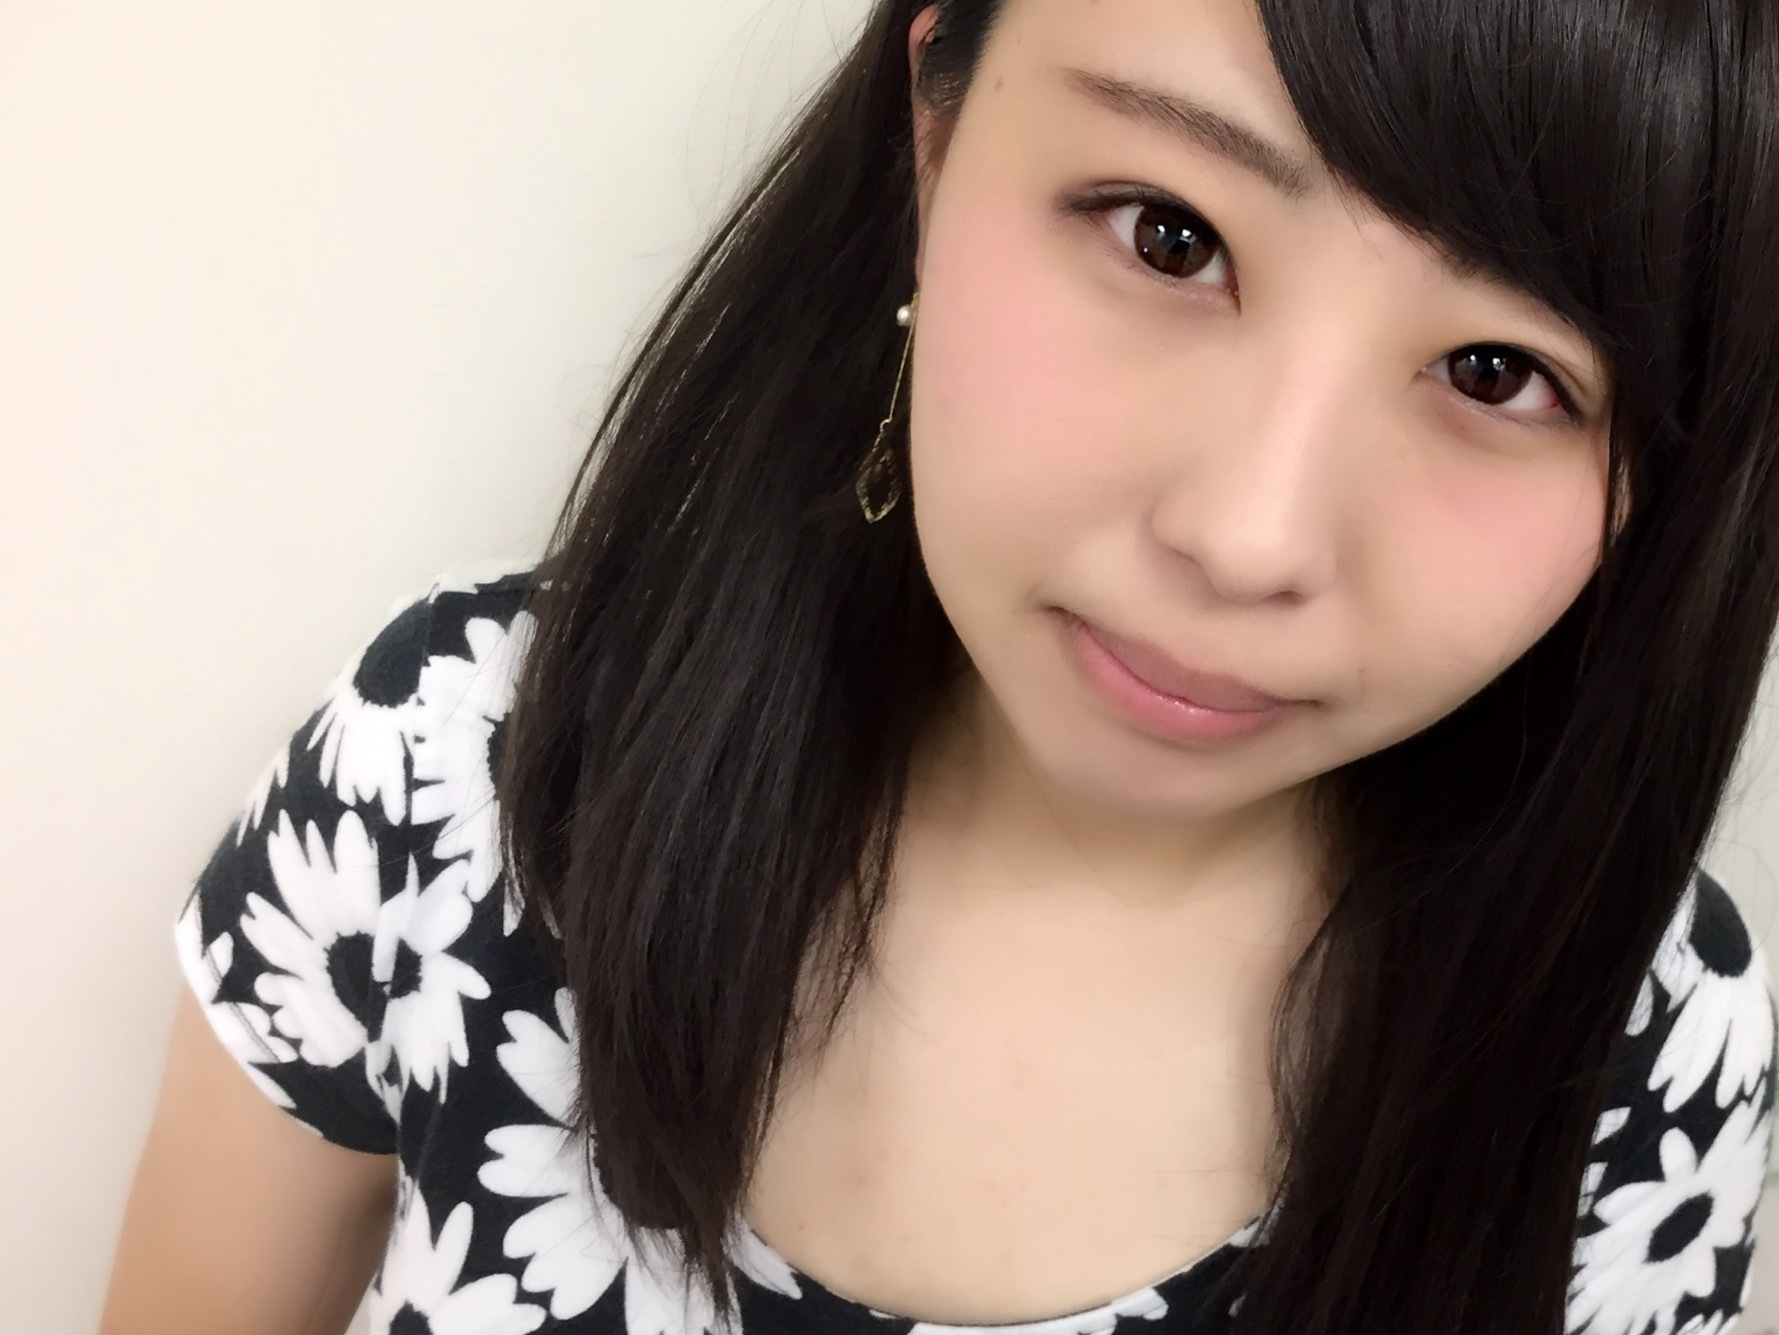 pqAZUpq - Japanese webcam girl